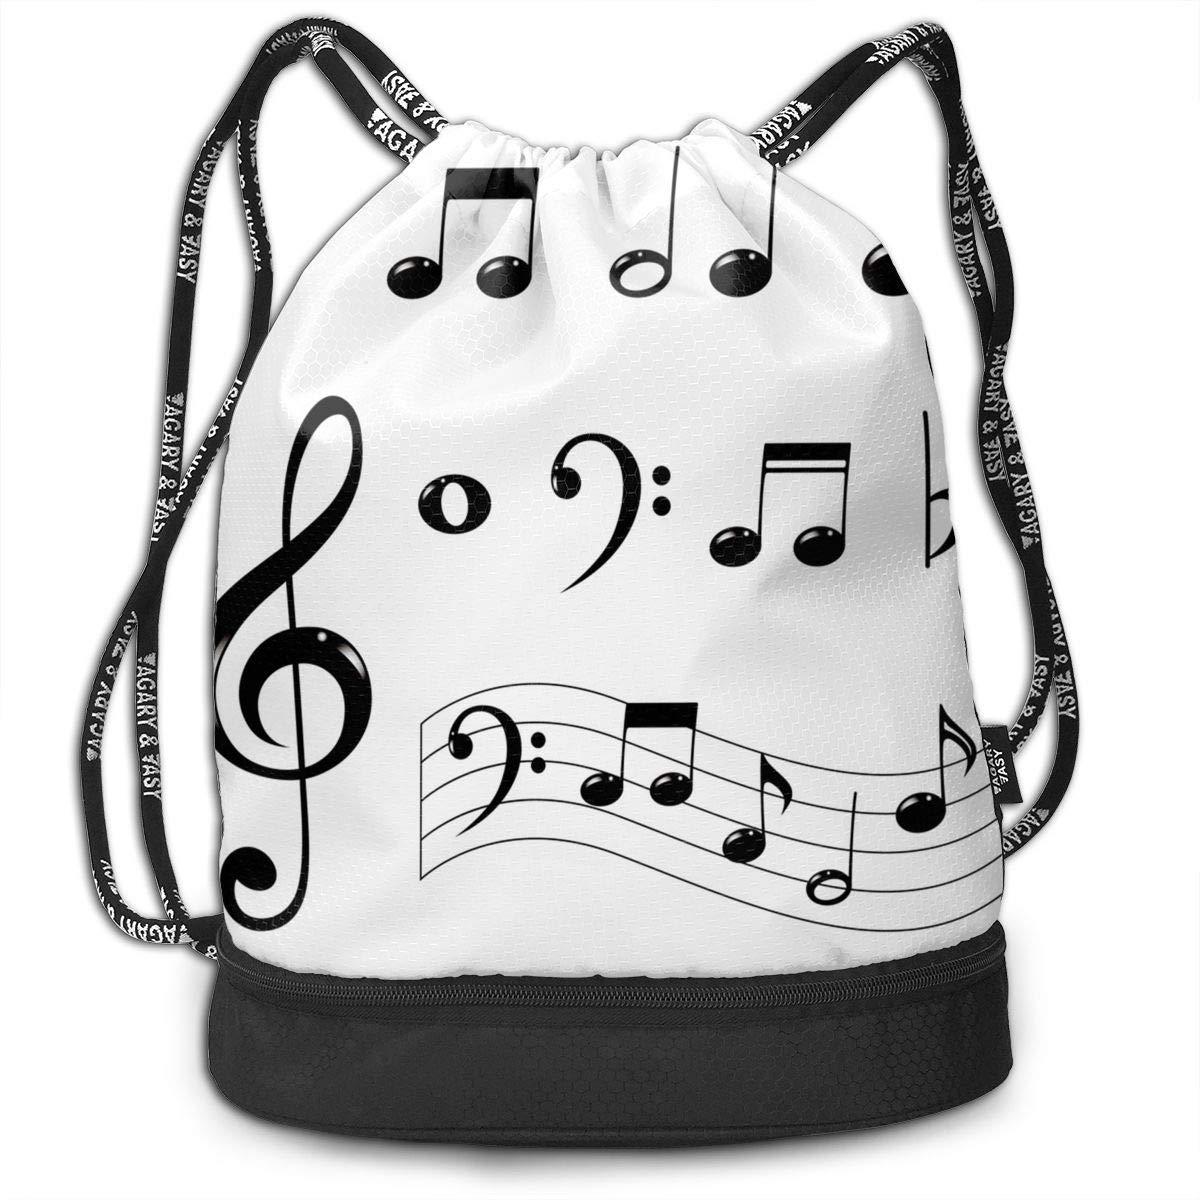 amazon drawstring bag music man armada womens gym backpack  amazon drawstring bag music man armada womens gym backpack personalized mens travel canvas bags for unisex health personal care